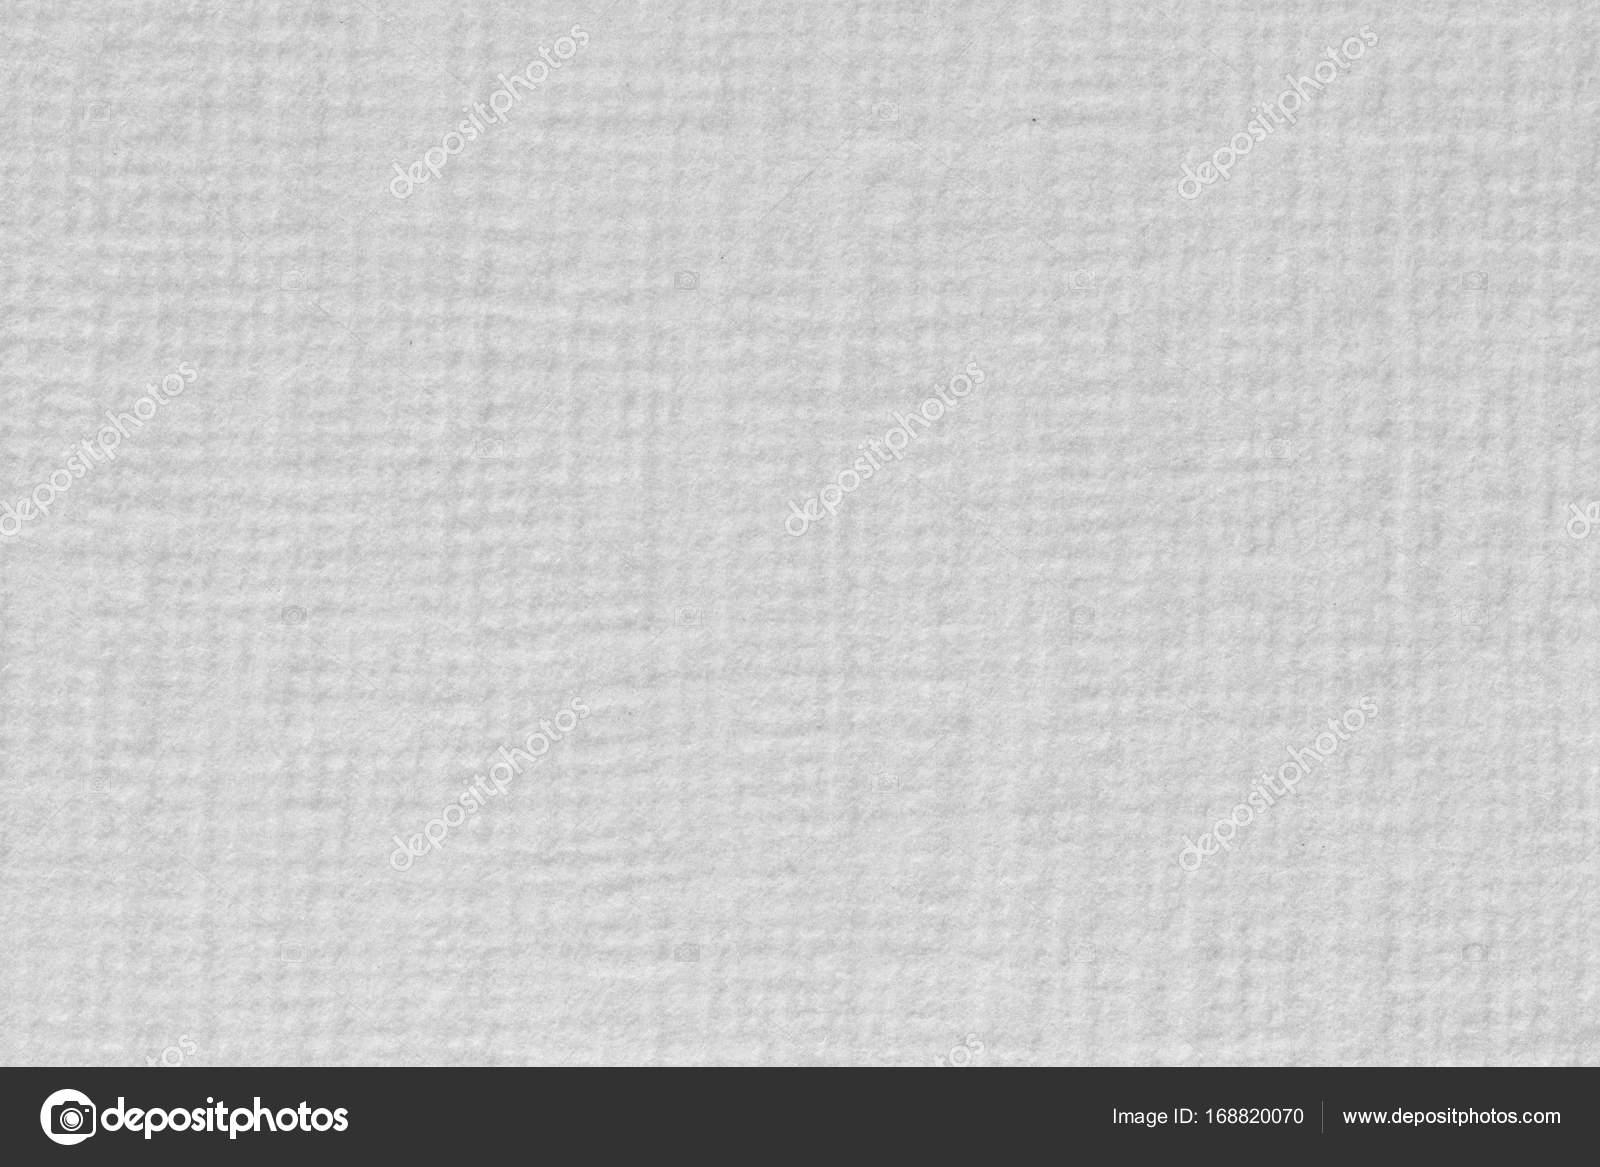 Elegant Pale Grey Writing Paper Textured Background Stock Photo